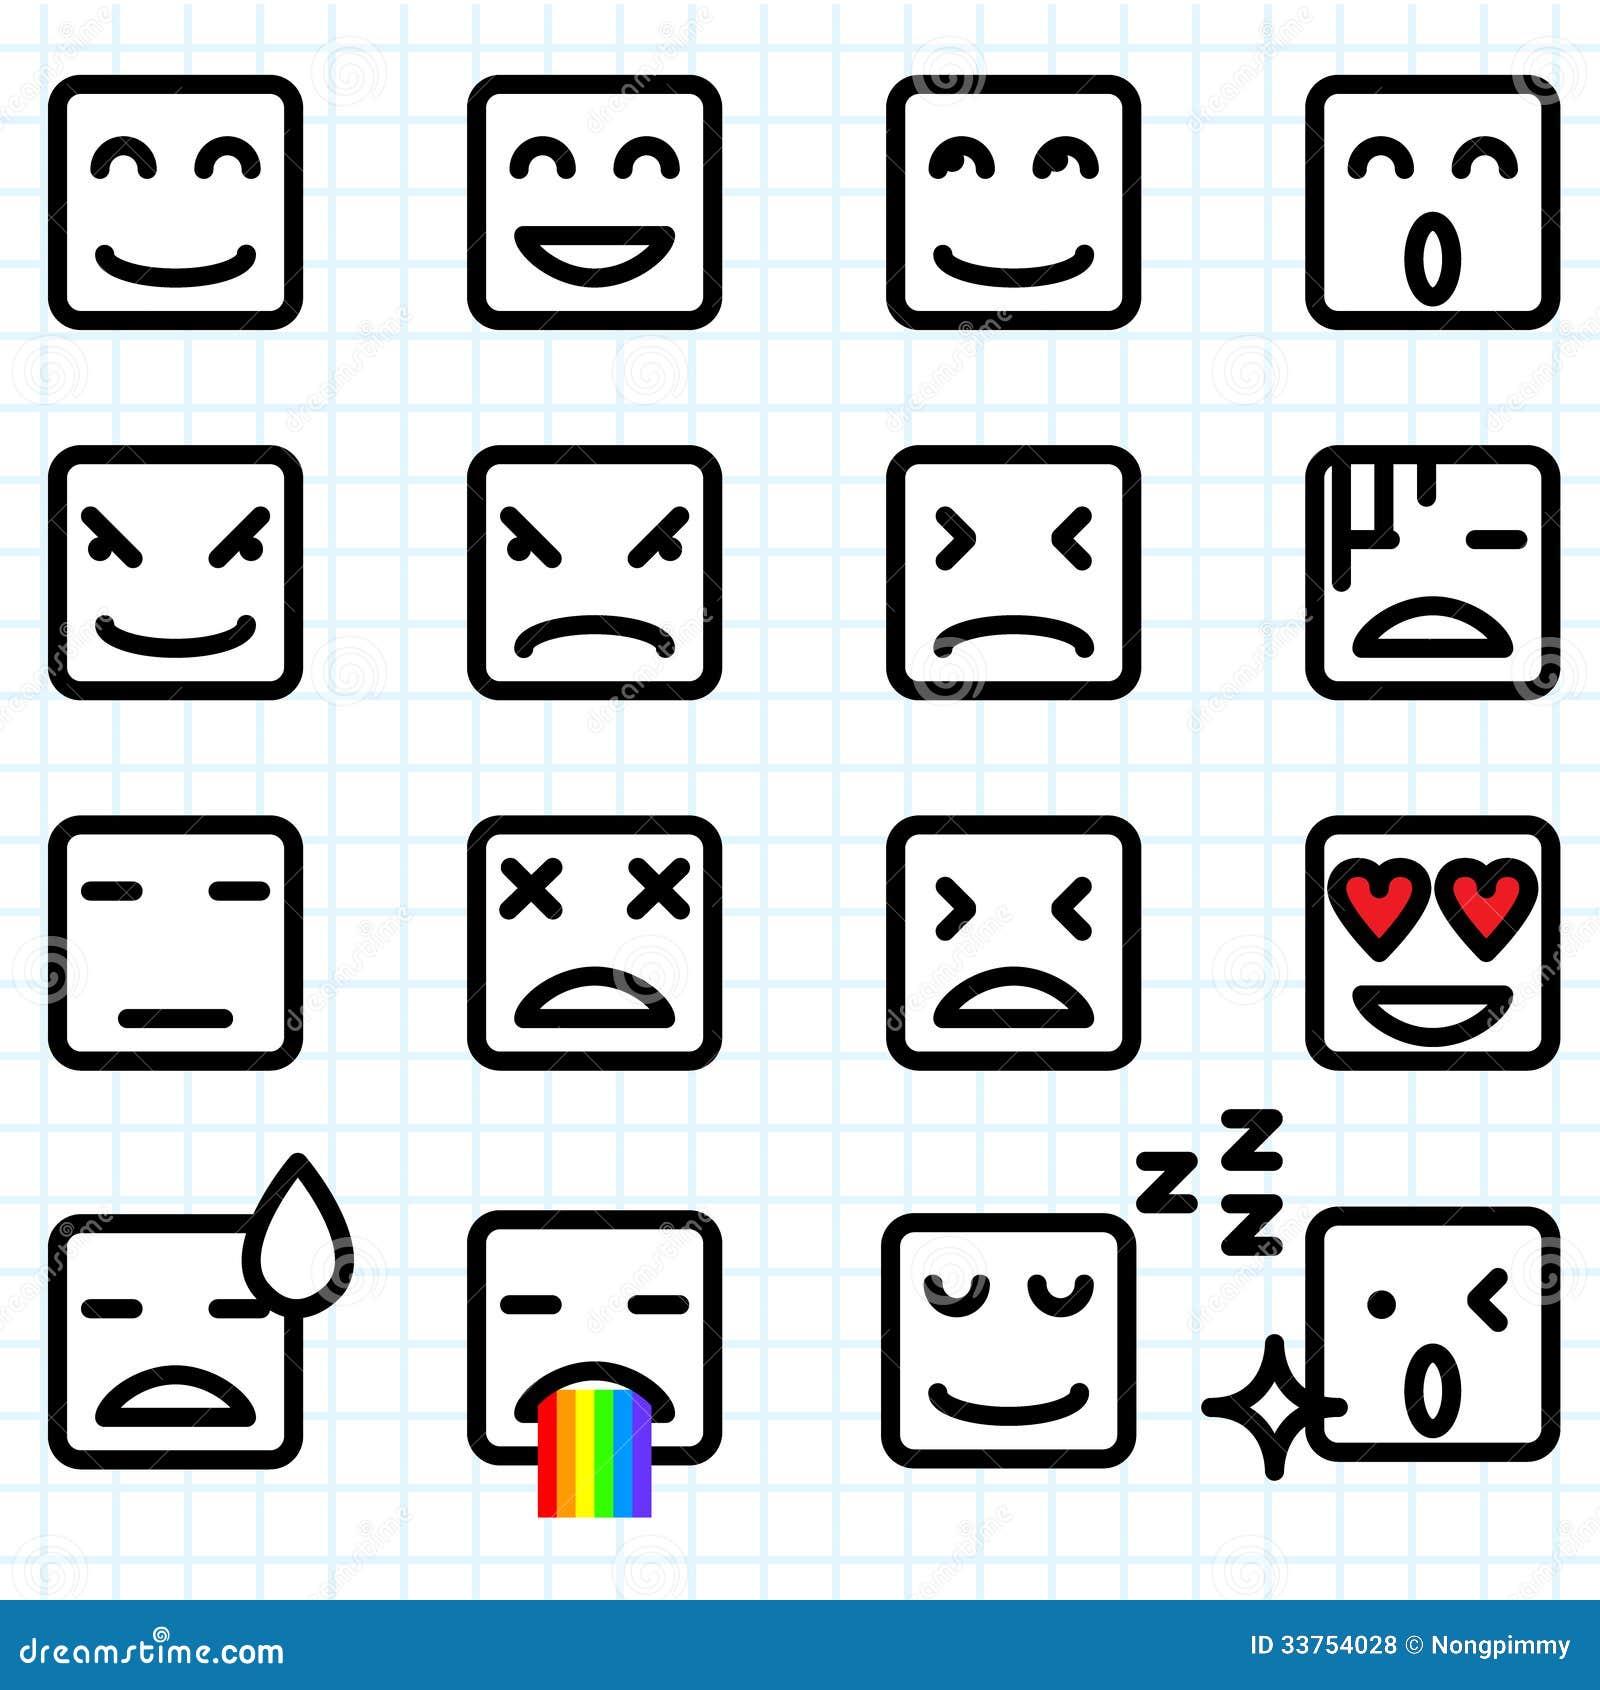 Square Face Emoticons Illustration Set Emoticon Icon